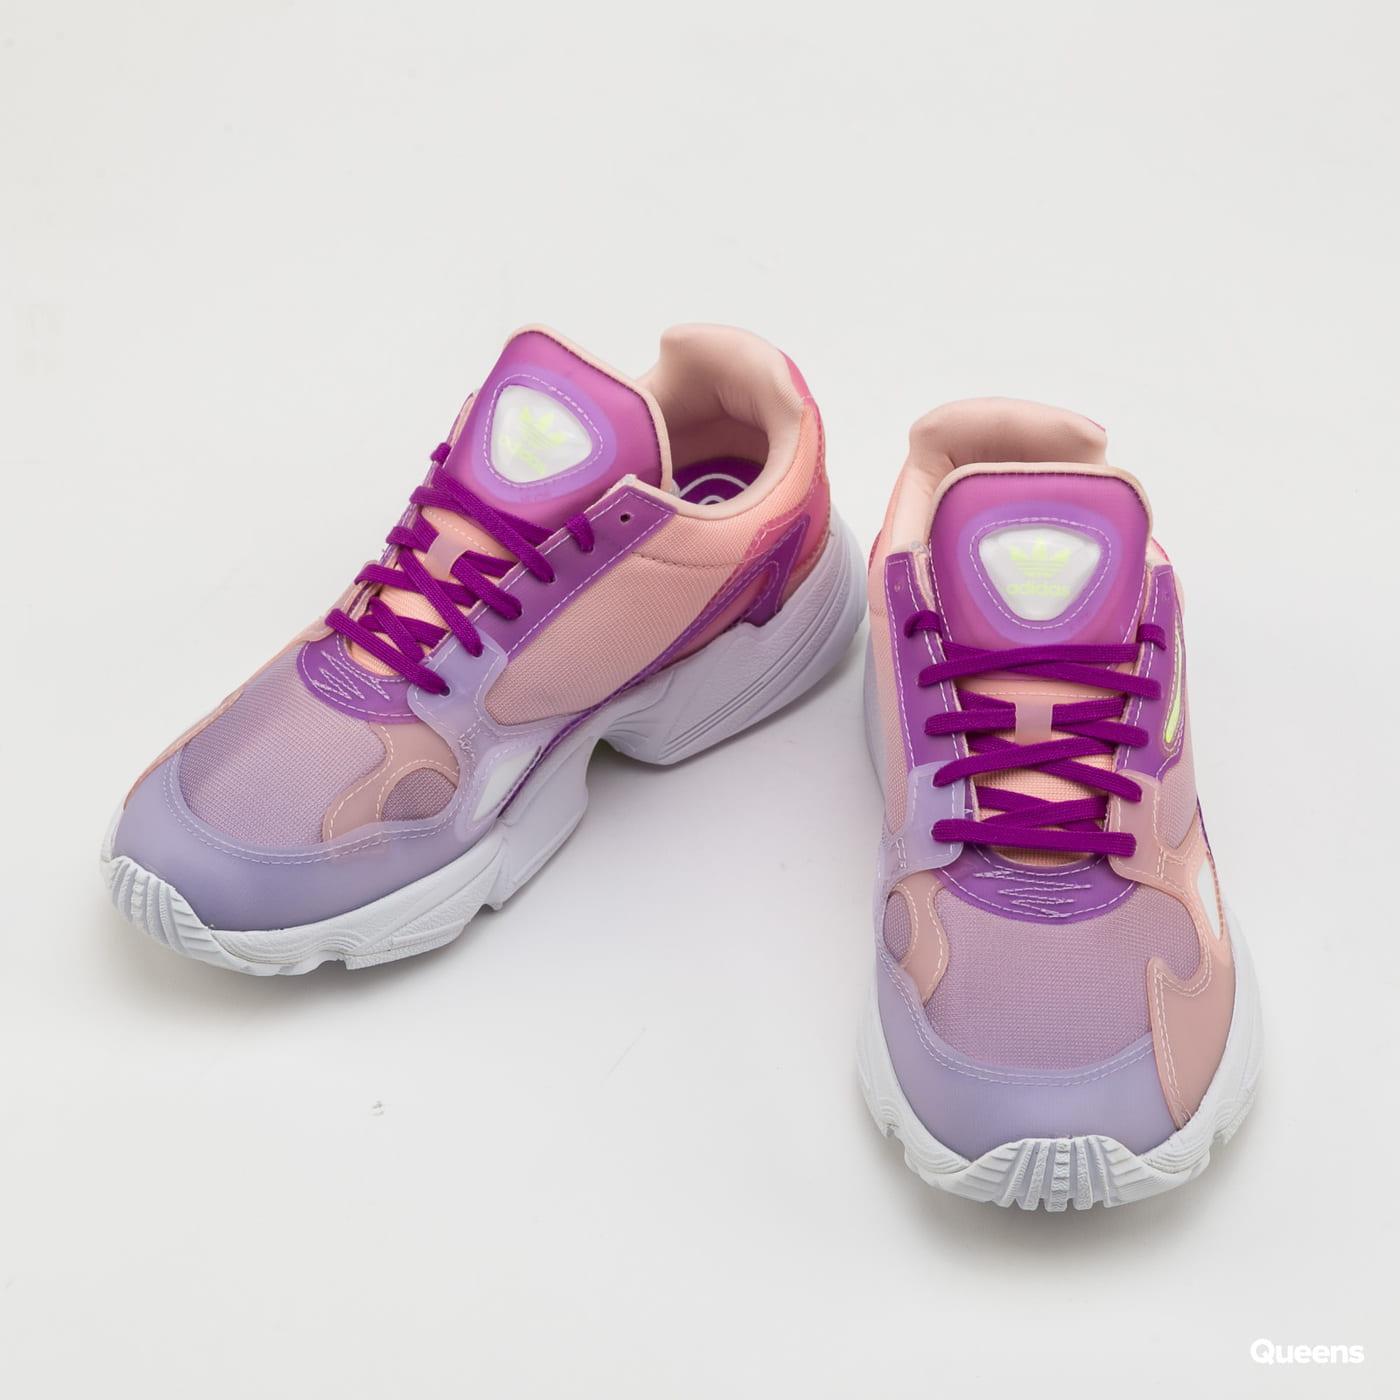 adidas Originals Falcon W blipur / shopur / hazcor